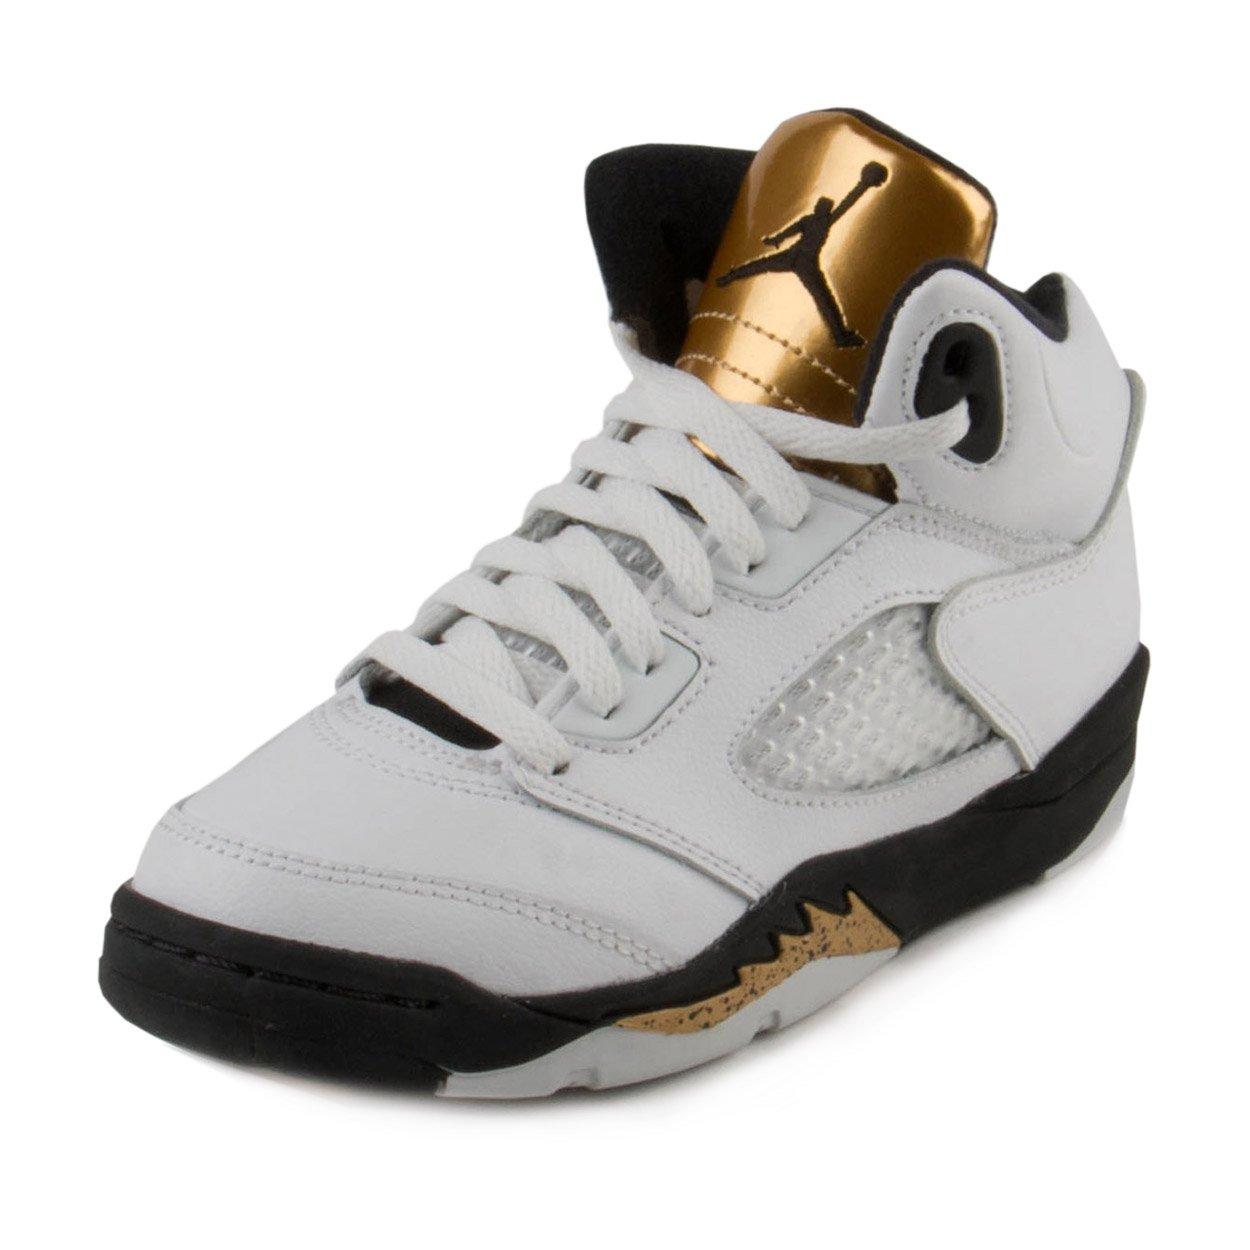 Nike Baby Boys Air Jordan 5 Retro BG ''Olympic Gold'' White/Black-Gold Leather Size 10.5C